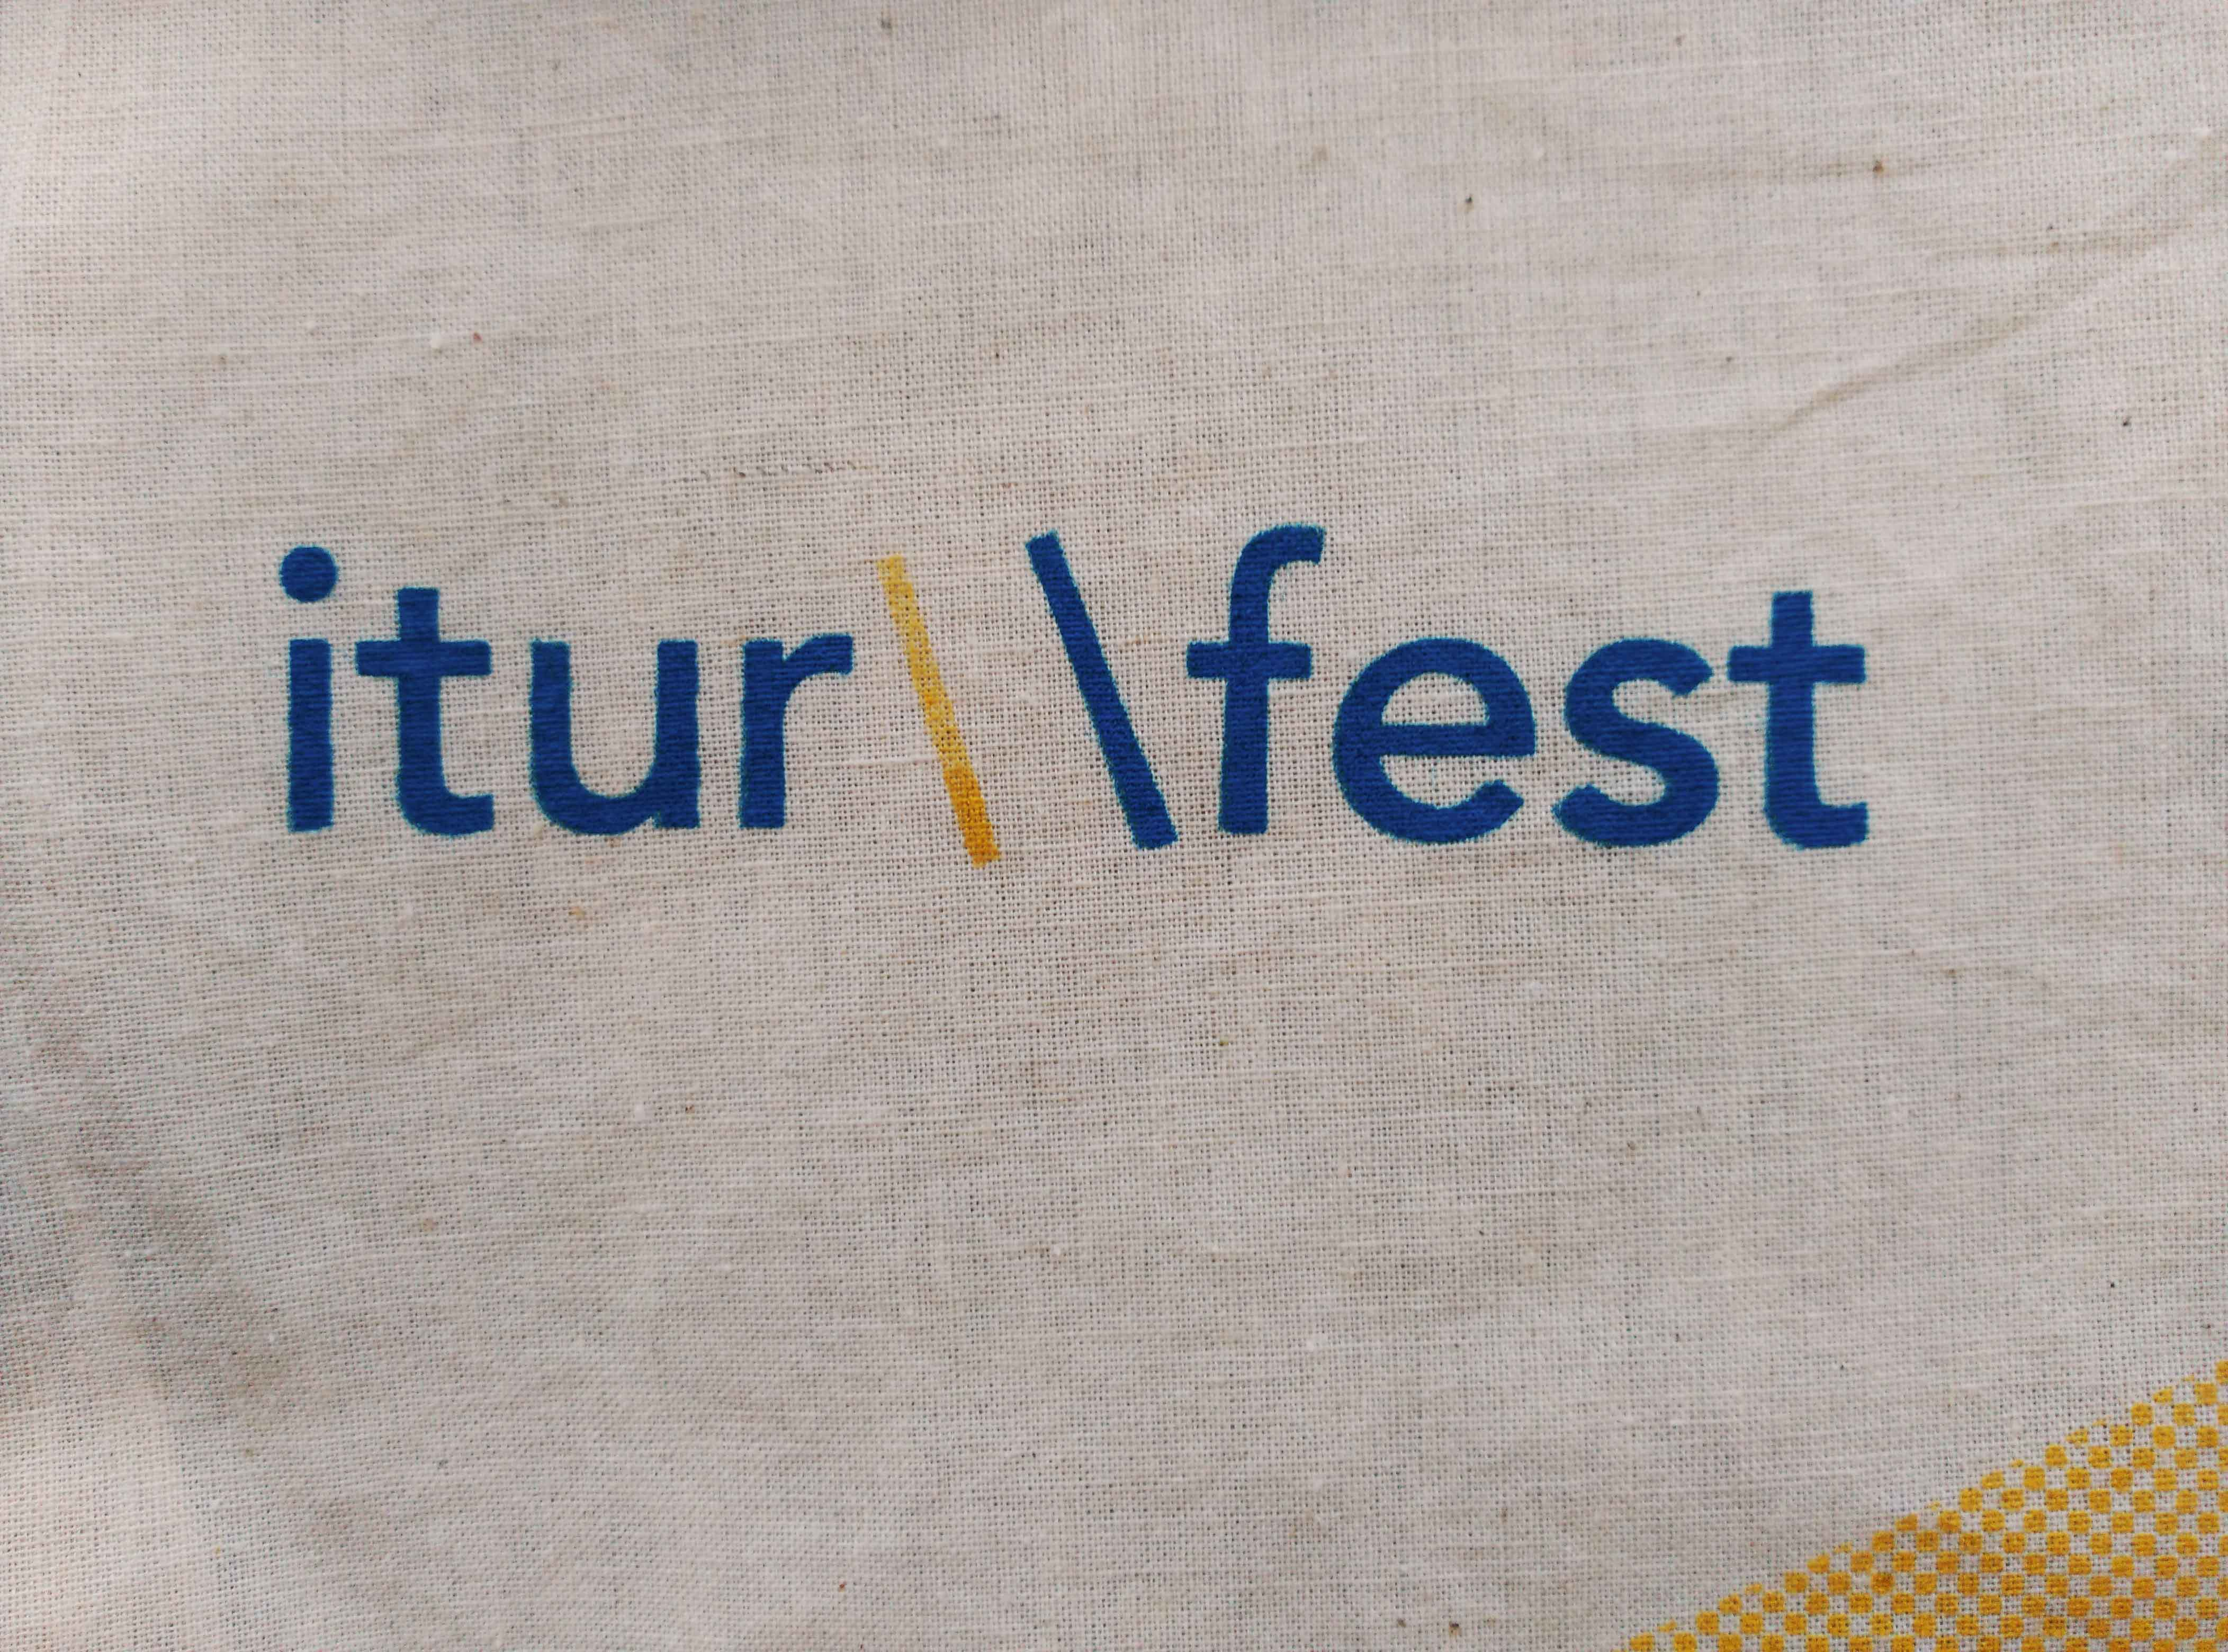 Detalle serigrafiado Iturfest